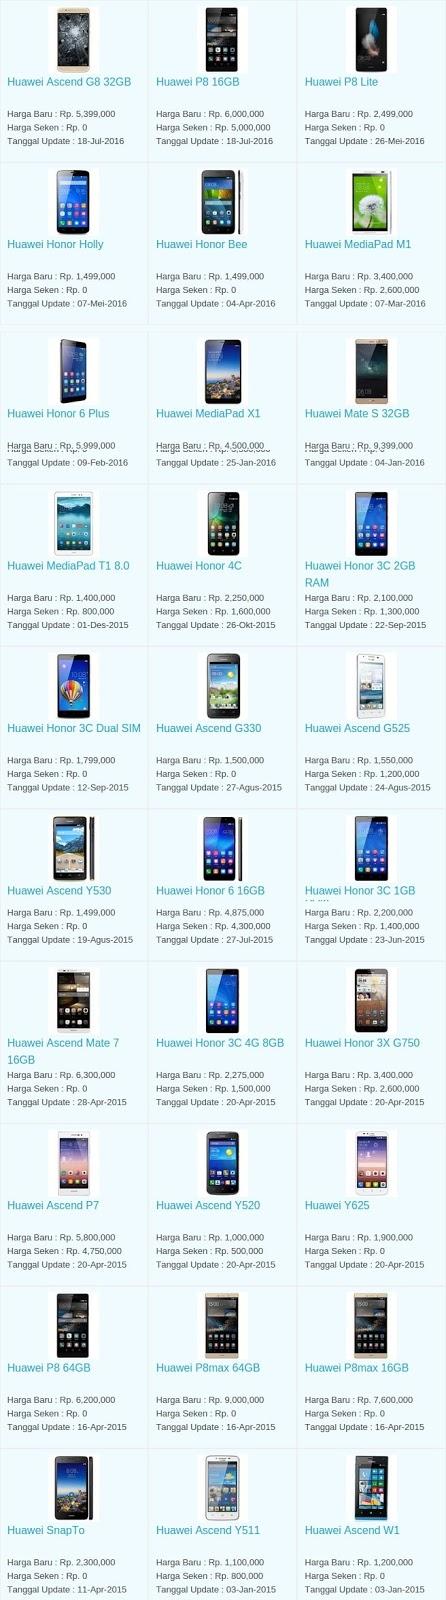 Harga Hp Terbaru Huawei Agustus 2016